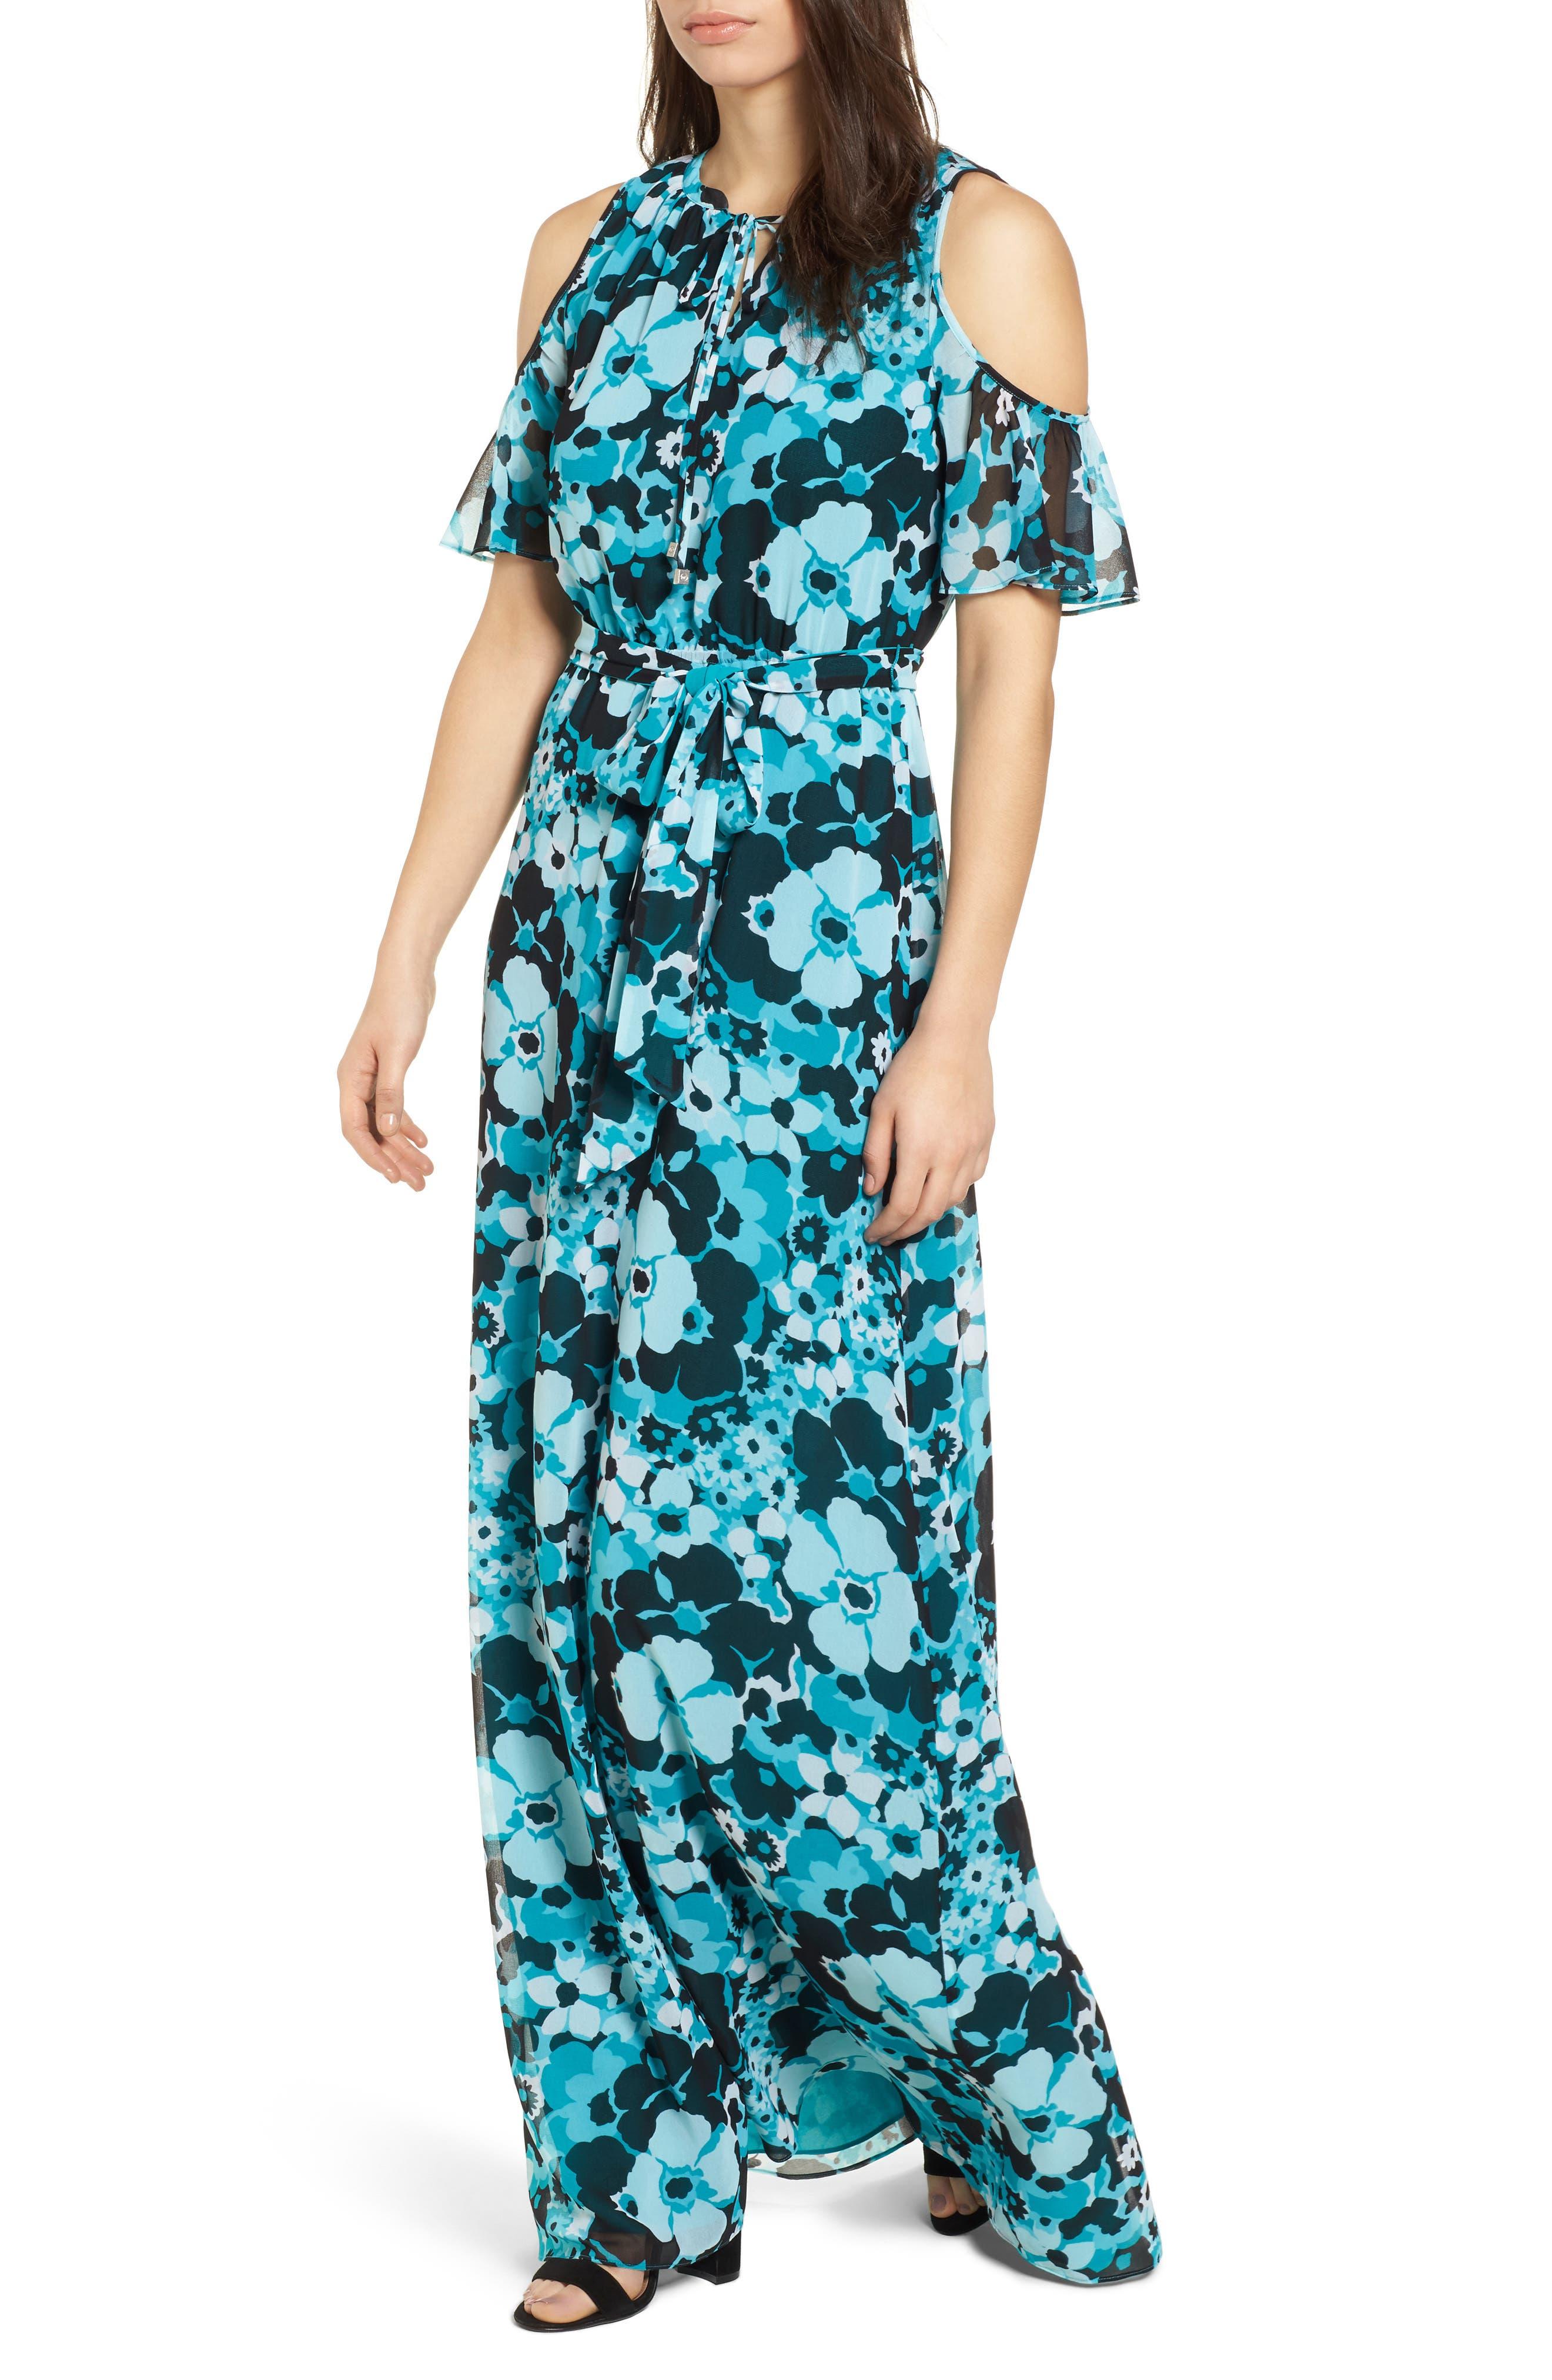 Spring Floral Maxi Dress,                         Main,                         color, Tile Blue/ Black Multi